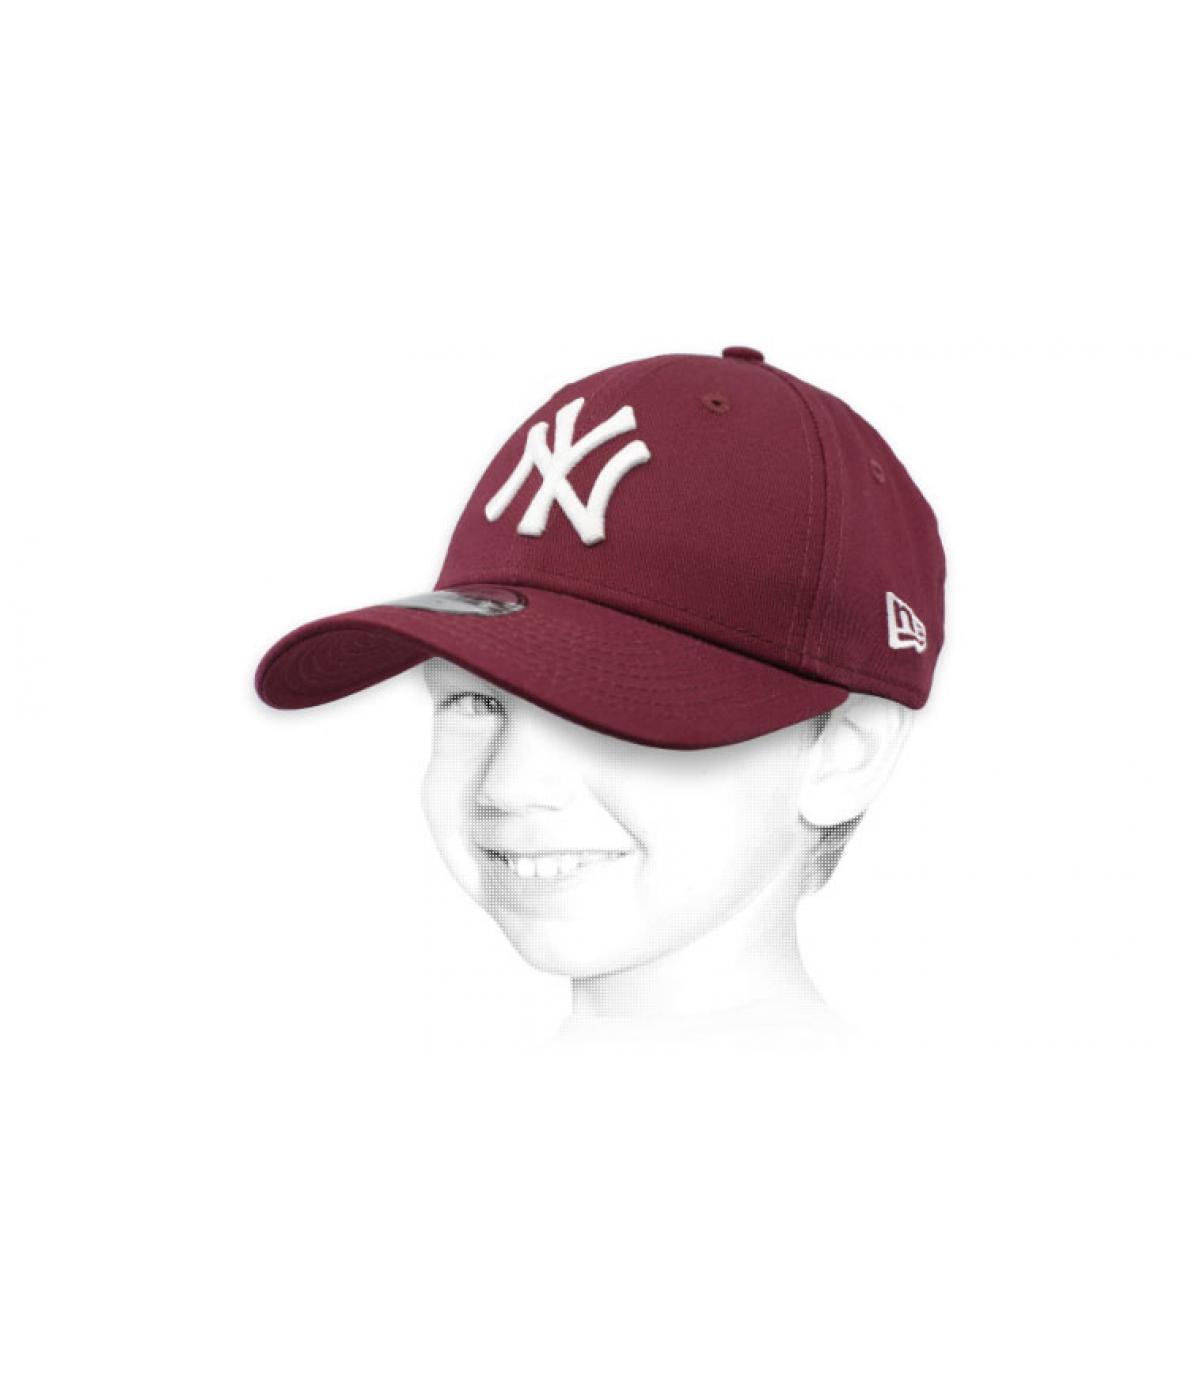 casquette NY enfant violet